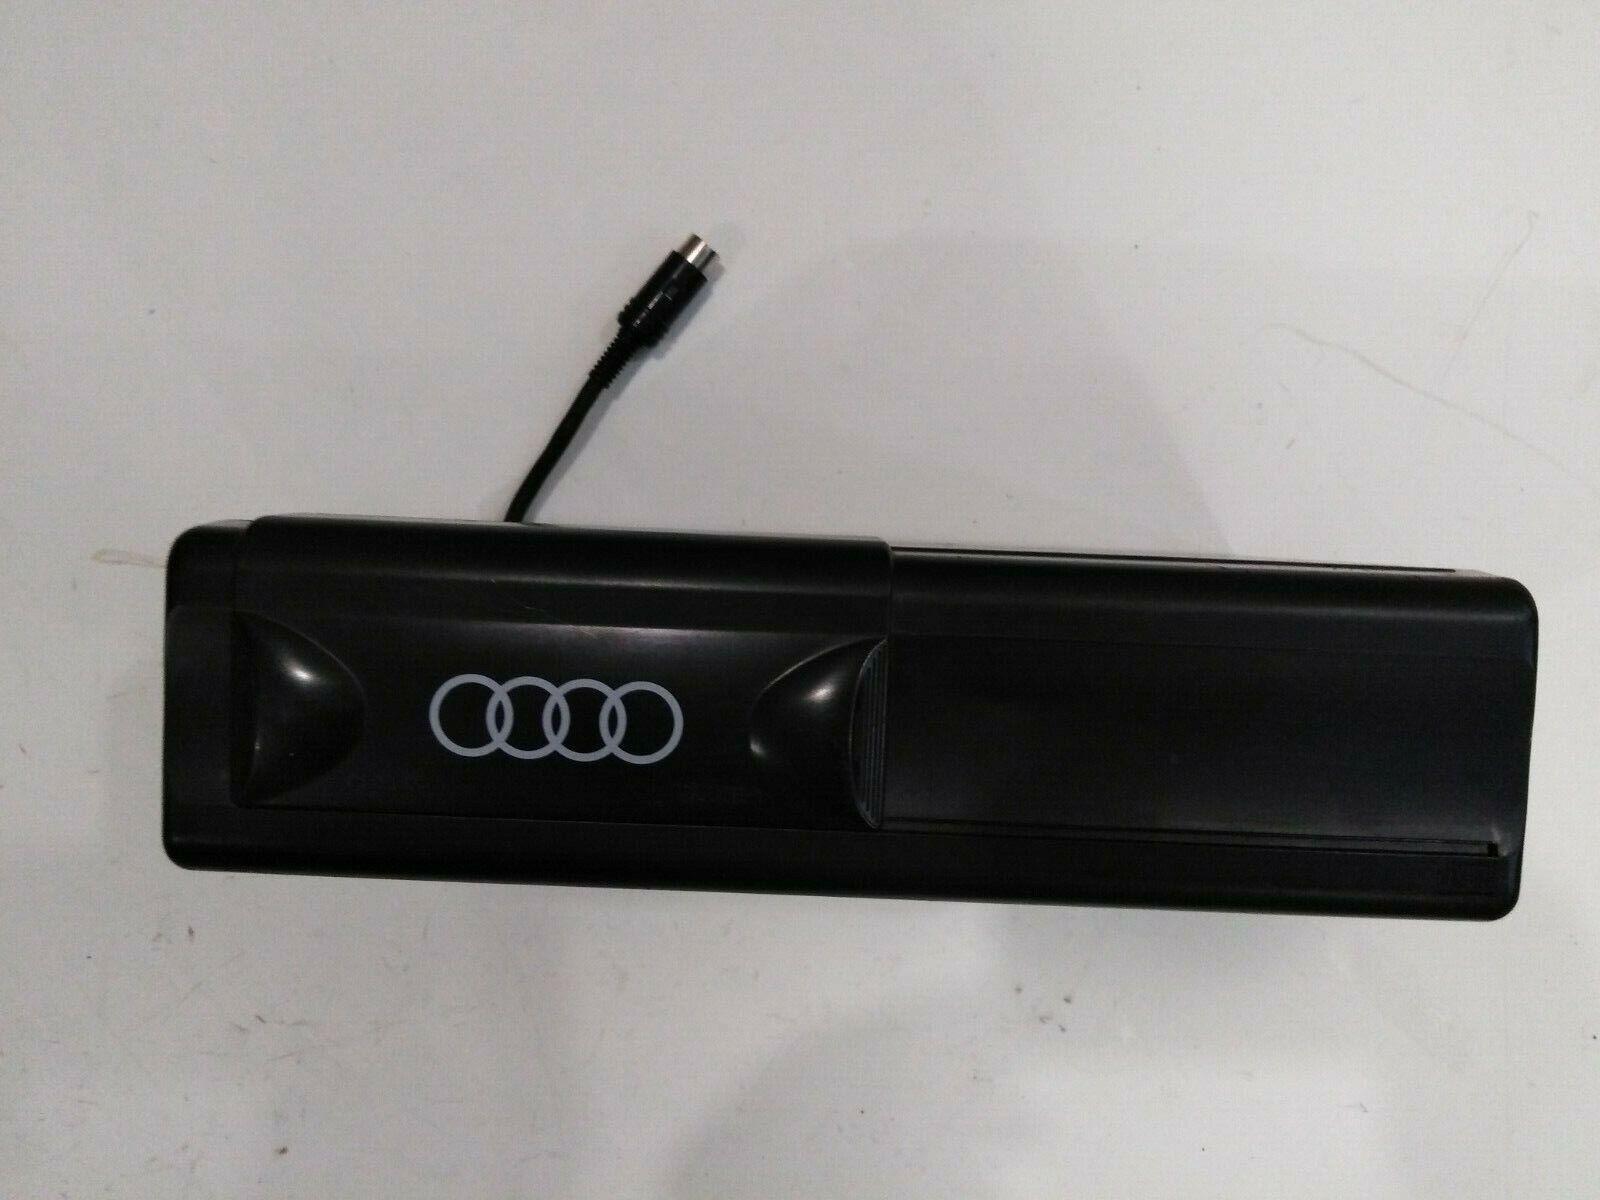 Audi a8 d2 a6 c5 CD changer 4d0035111 # A02